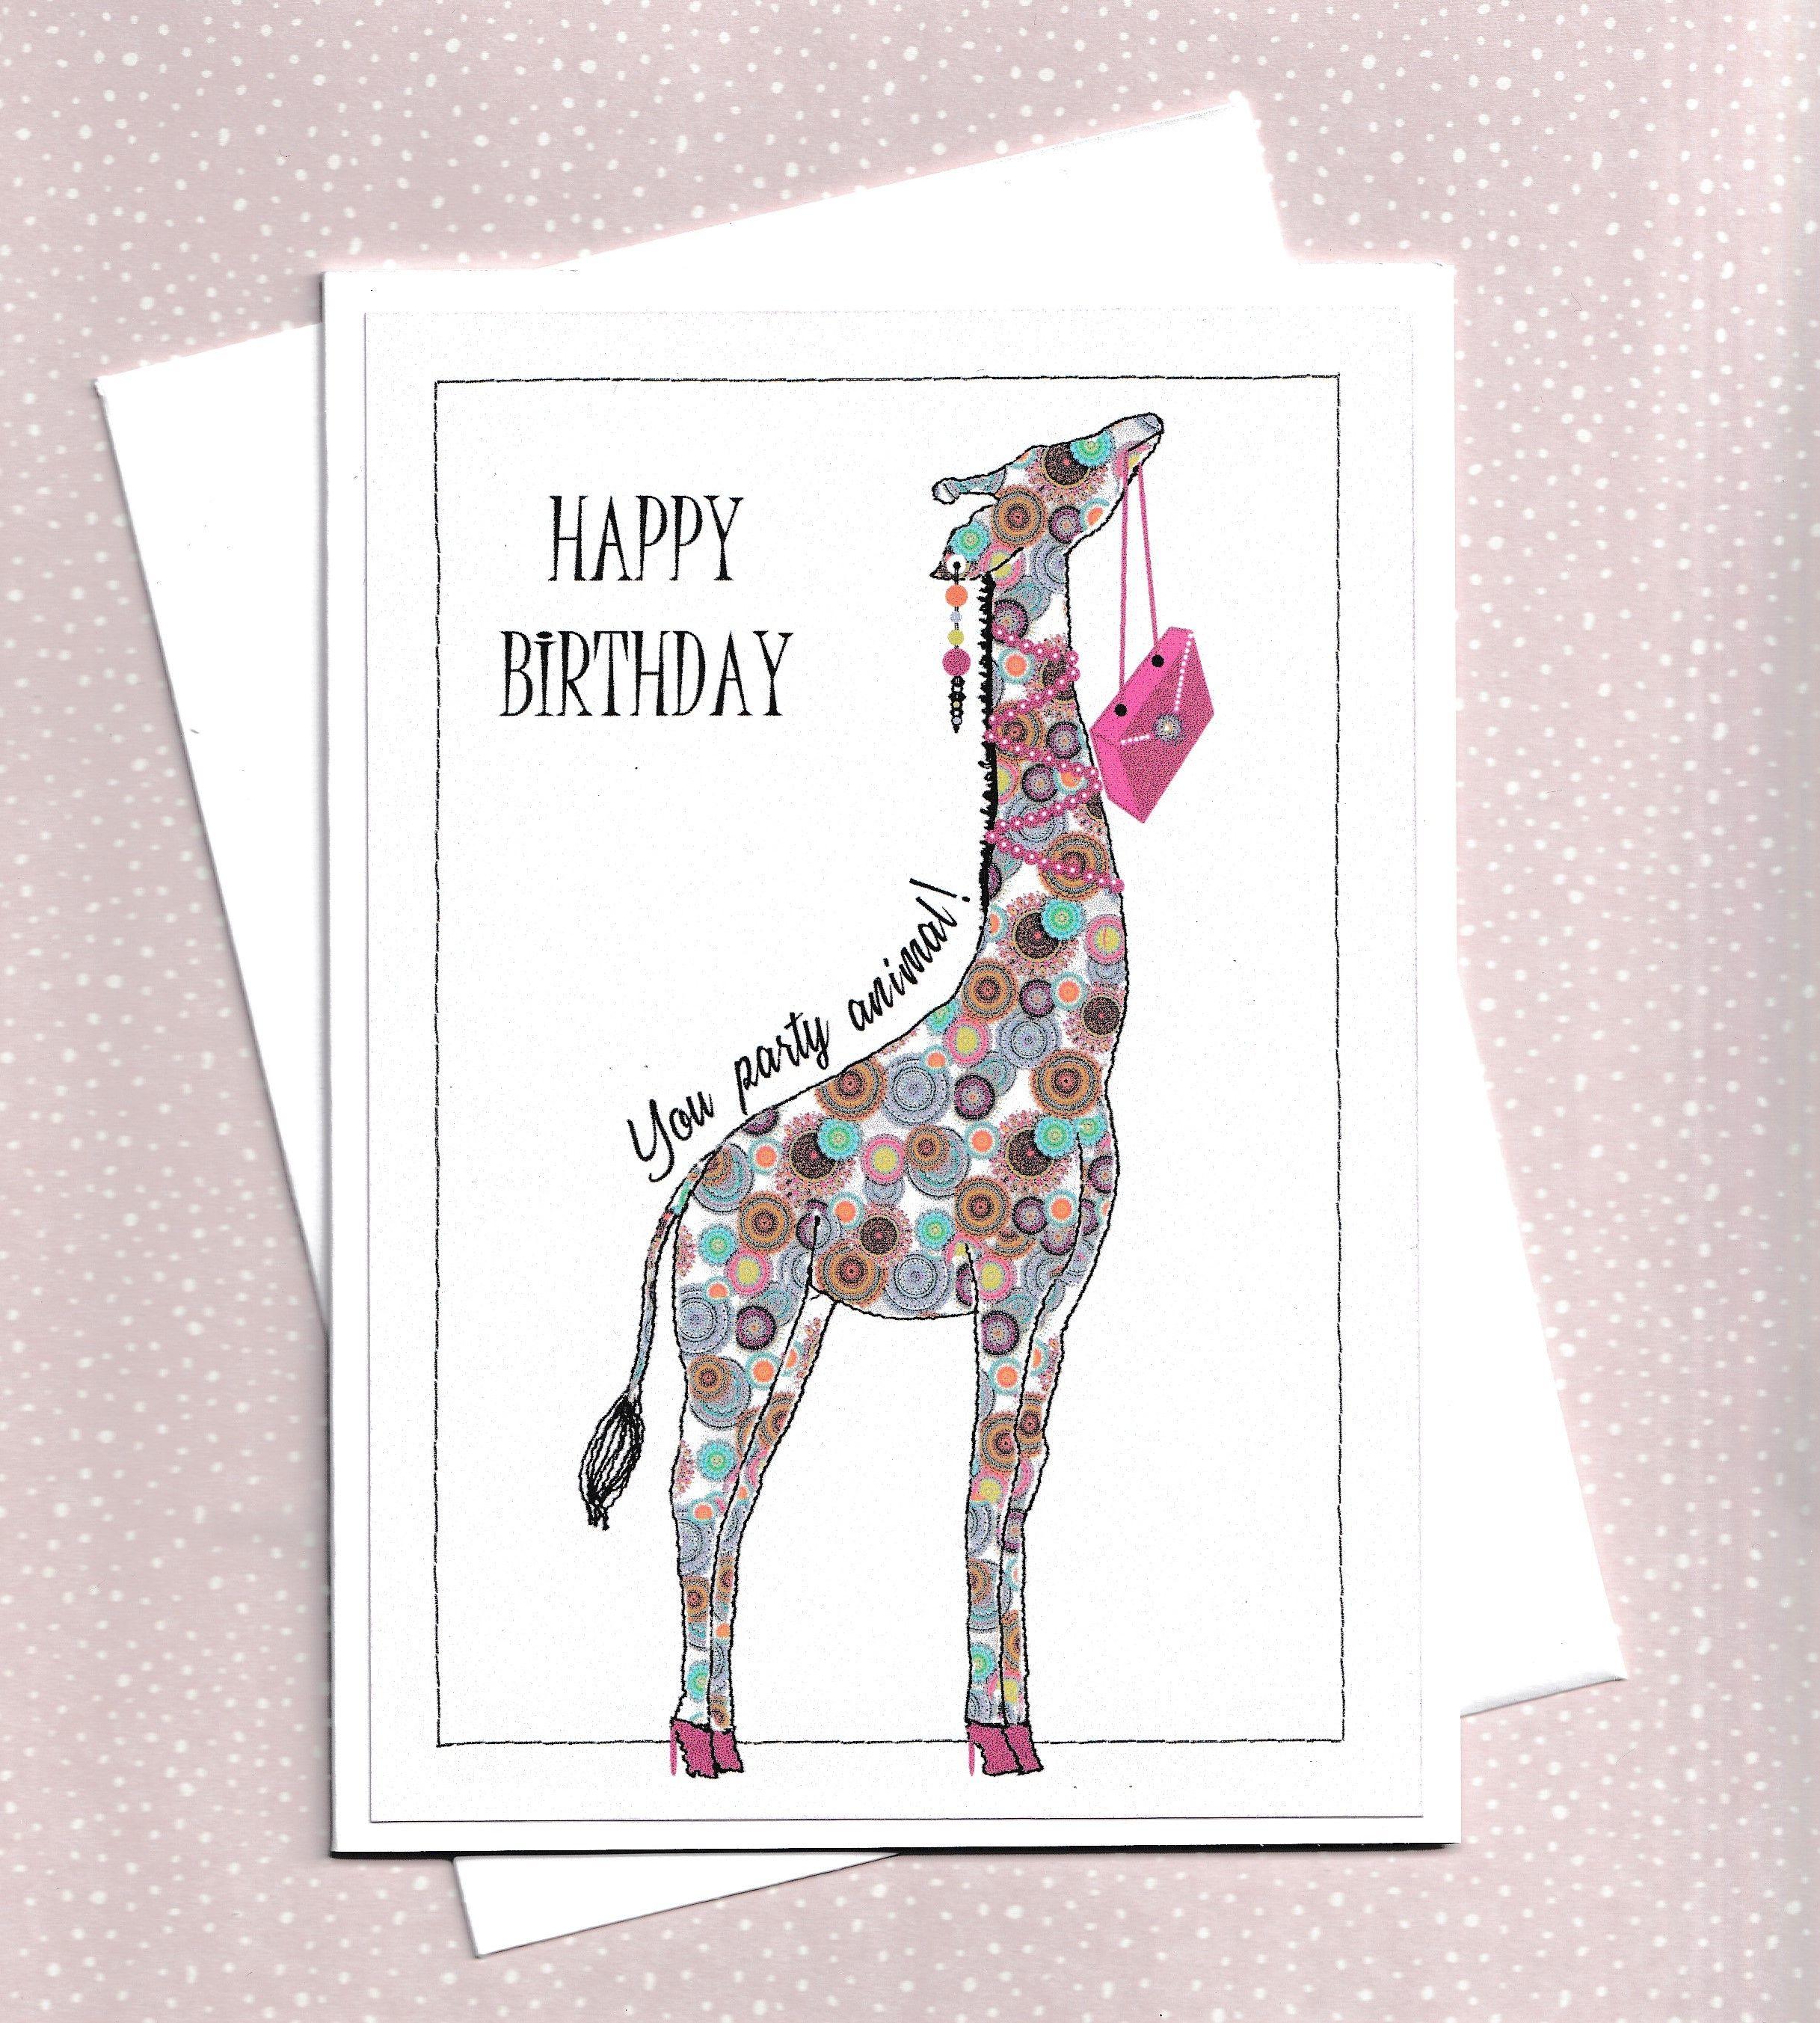 Giraffe Happy Birthday Card For Her Bestie Giraffes Etsy Birthday Cards For Her Giraffe Happy Birthday Birthday Cards